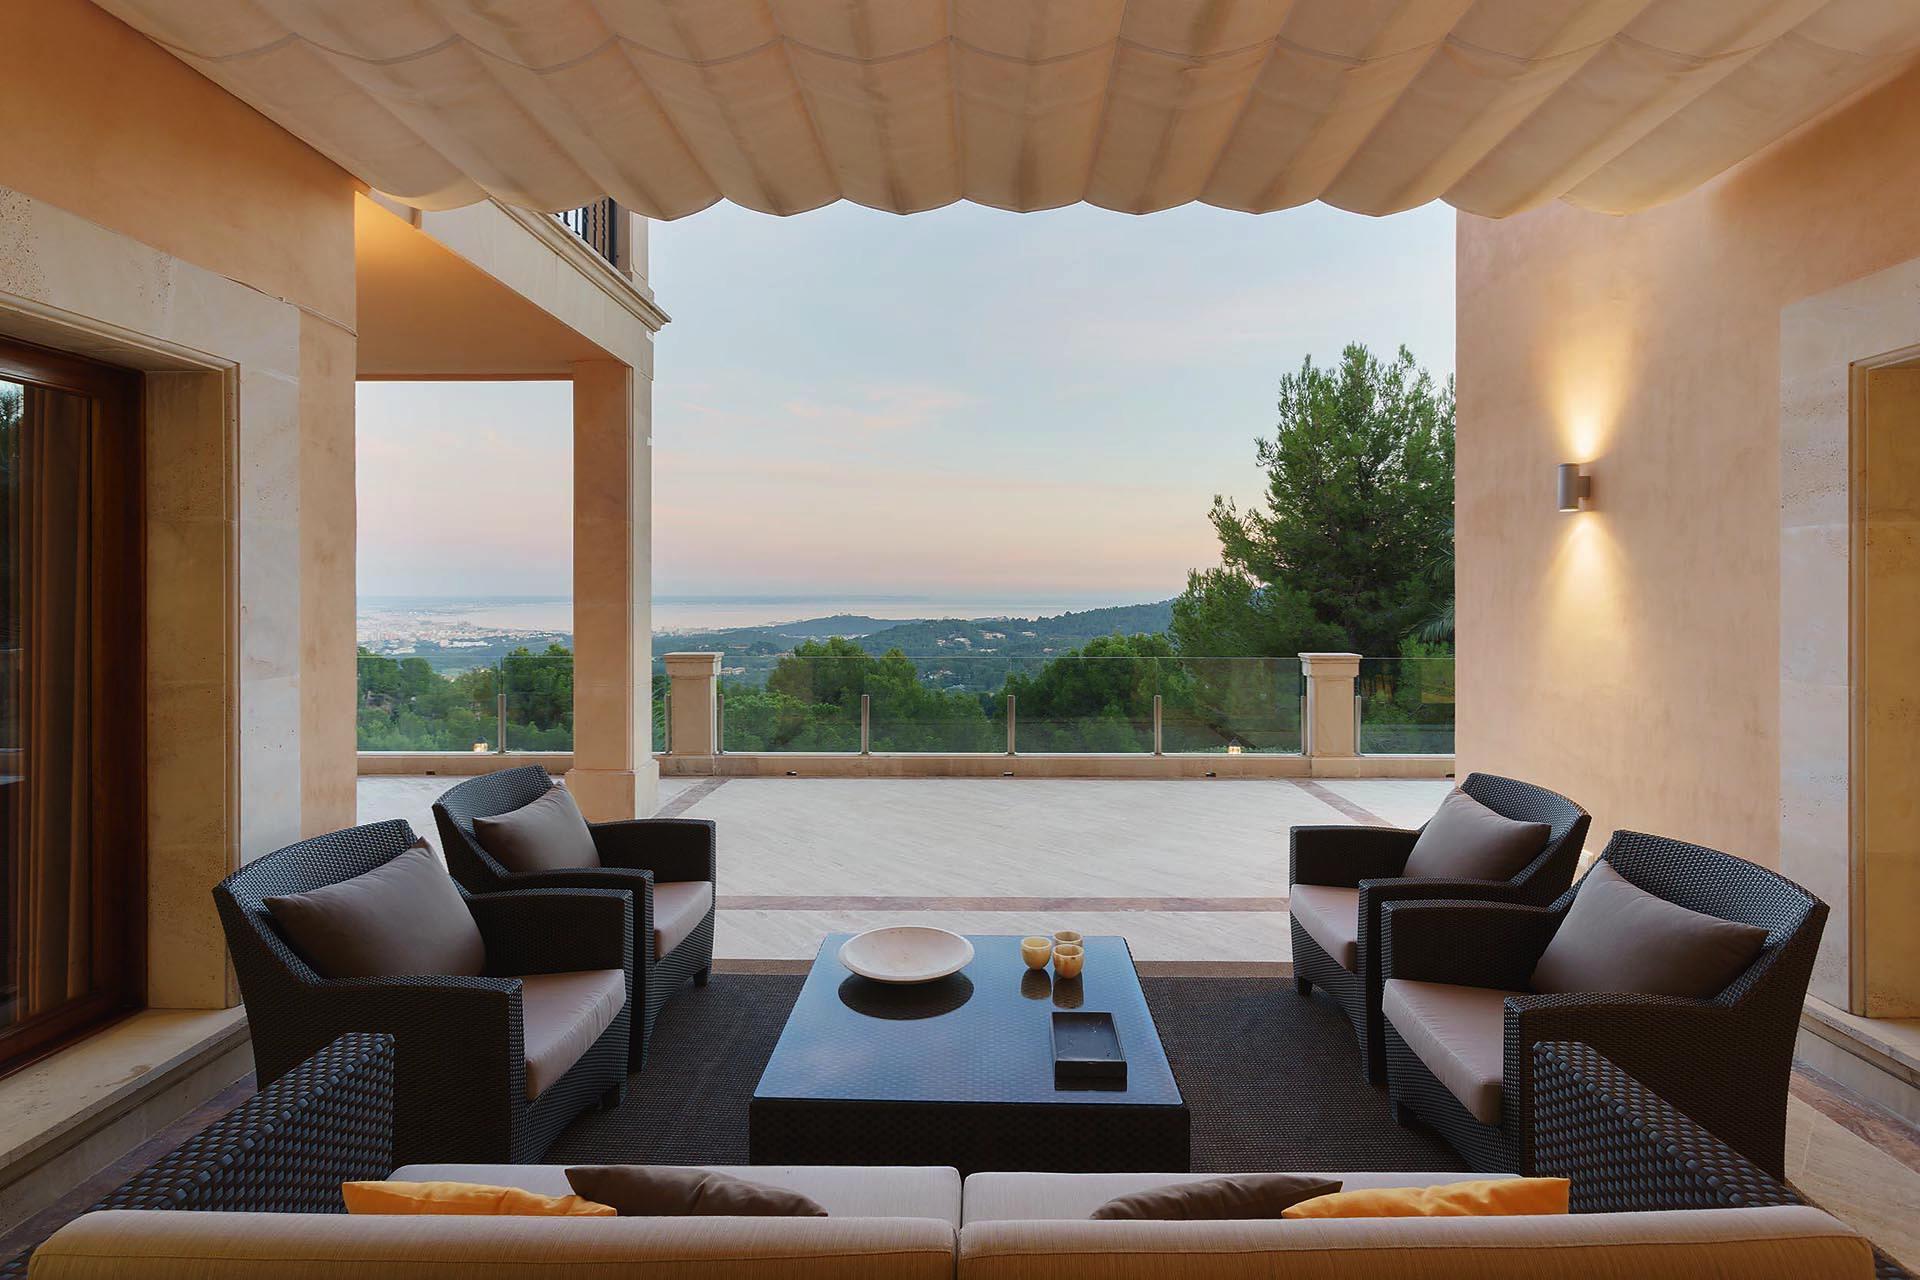 01-280 großzügige Villa nahe Palma de Mallorca Bild 9